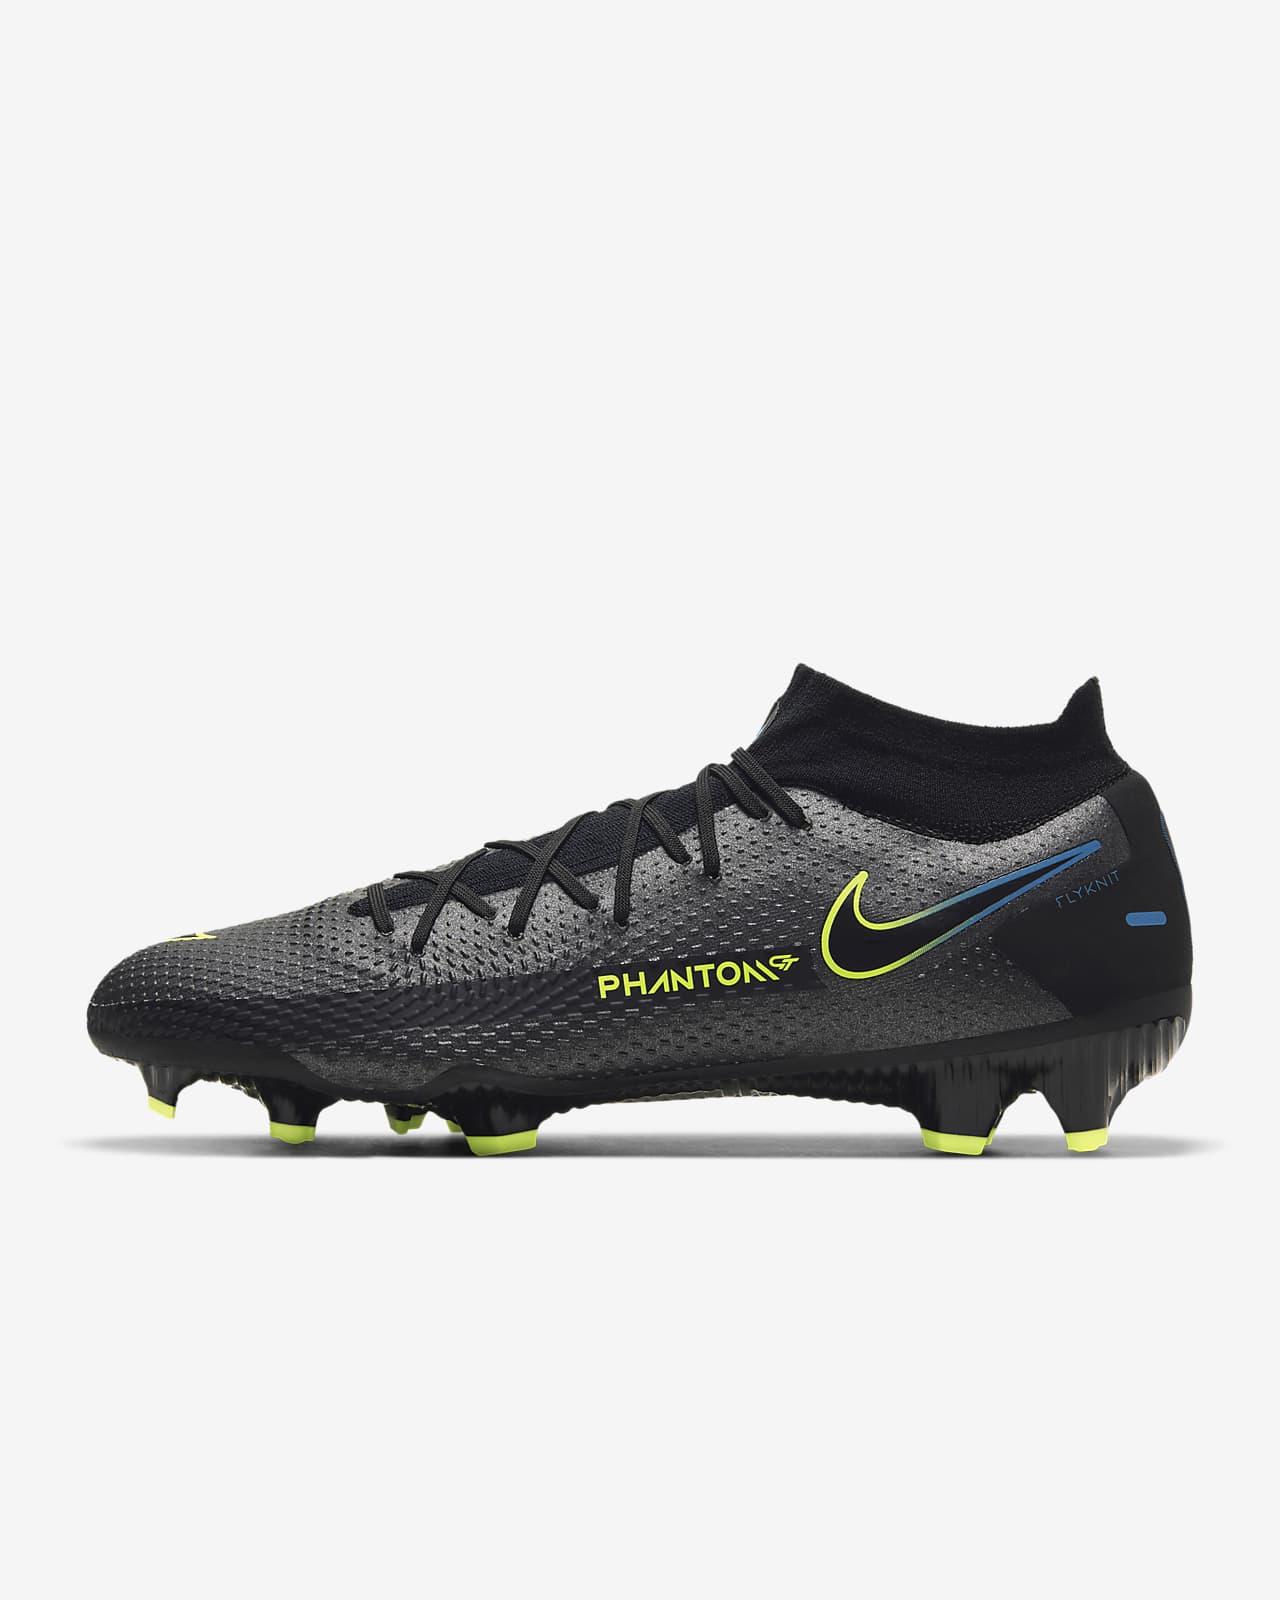 Nike Phantom GT Pro Dynamic Fit FG Botas de fútbol para terreno firme